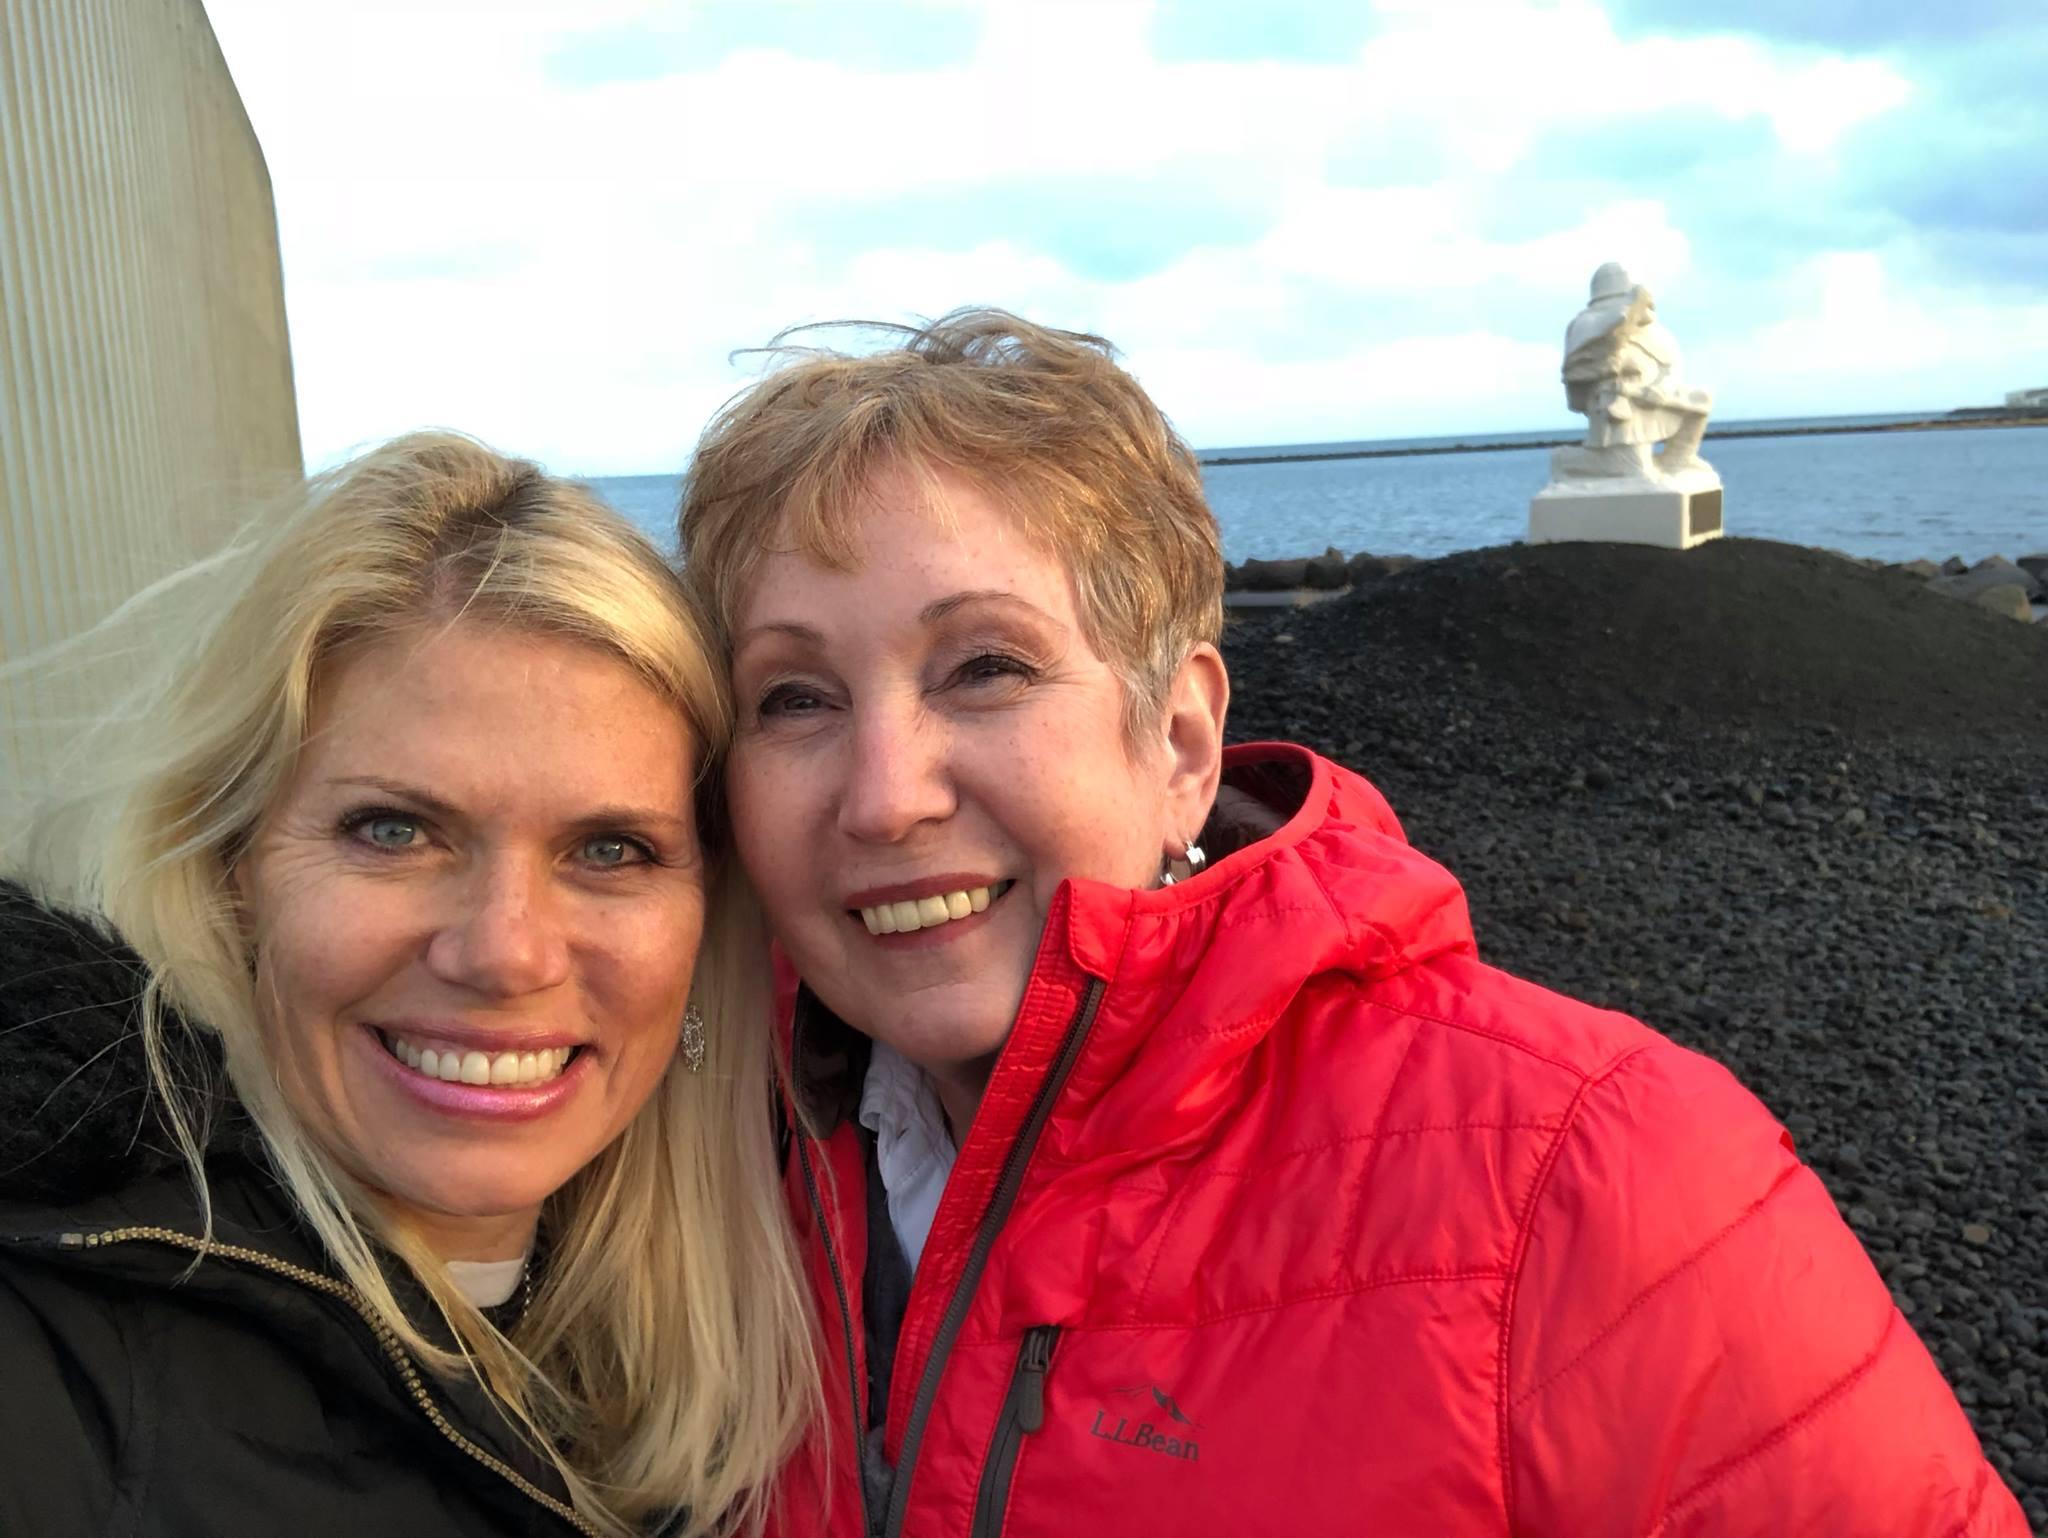 Iceland Trip Photo - Linda Ostovitz - 10.16.18